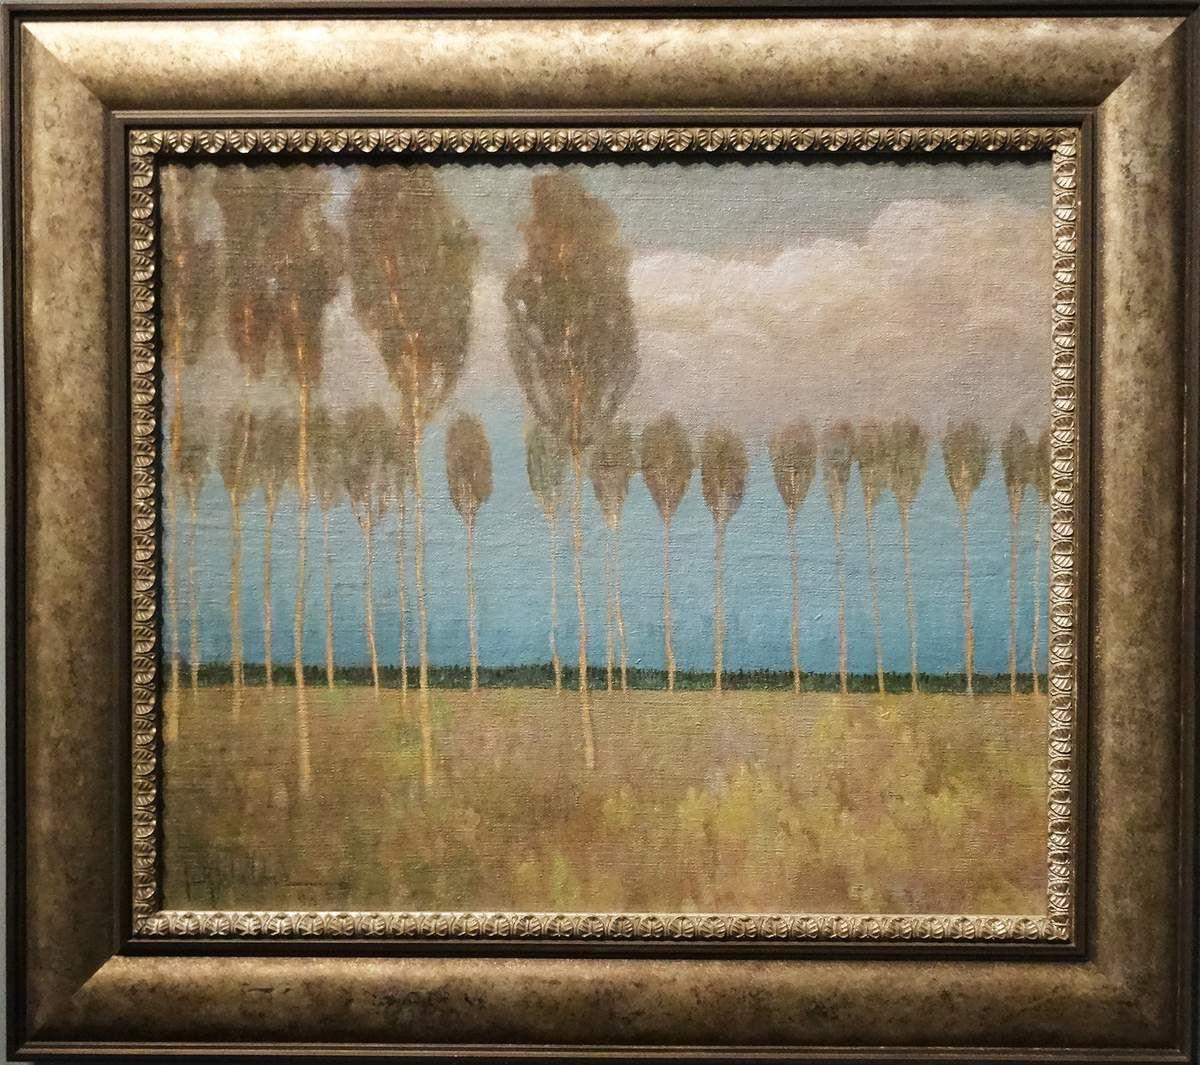 Peupliers - Huile sur carton - 1904 - Johann Walter - Lettonie